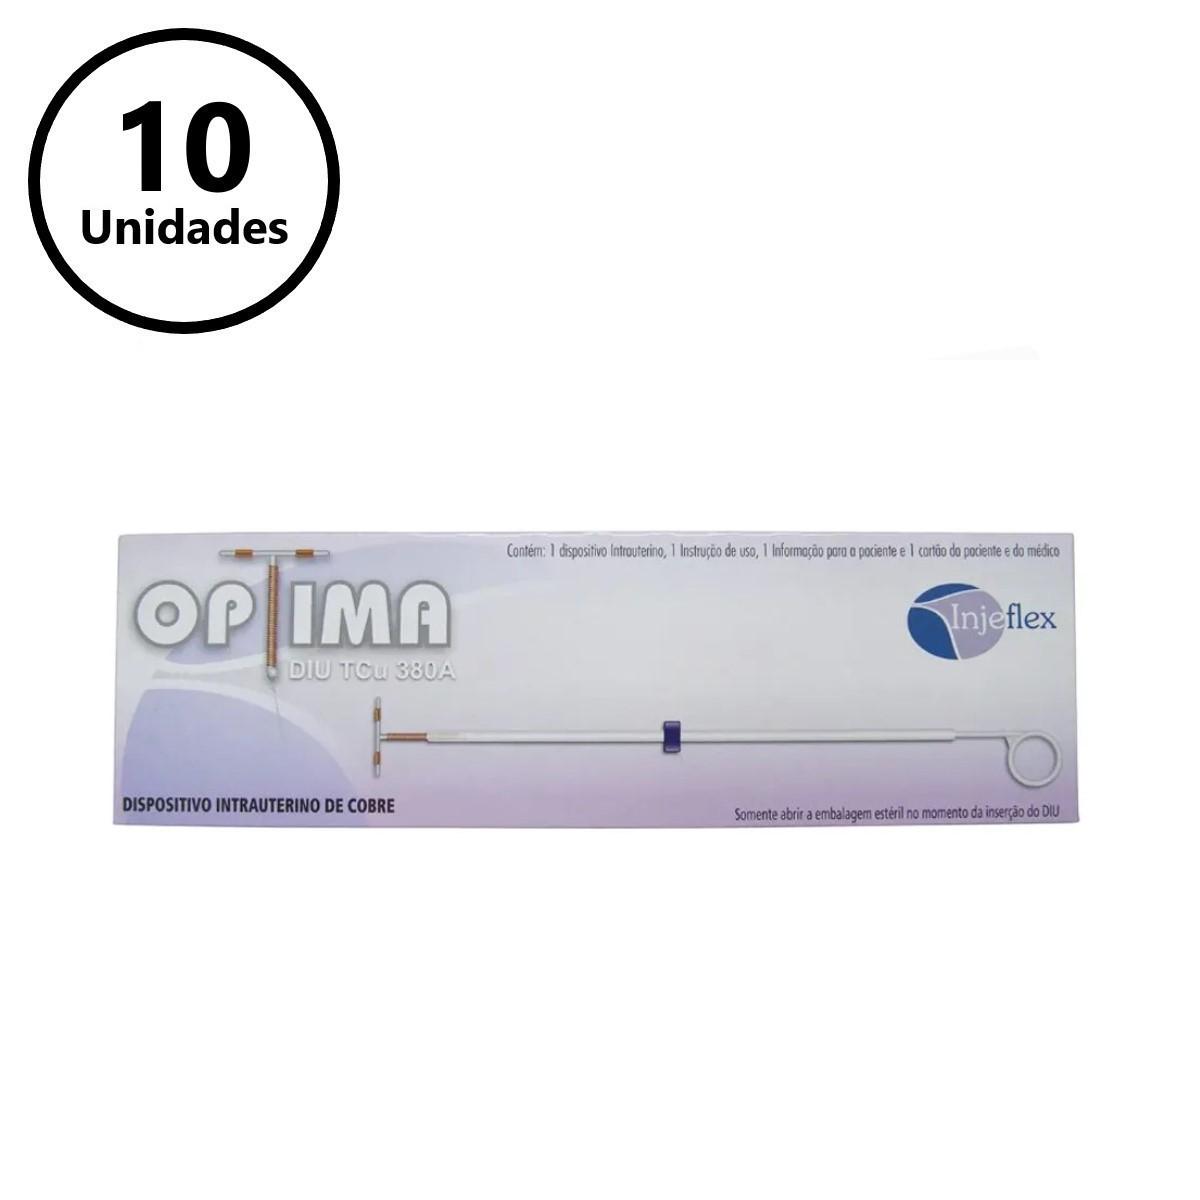 DIU DISPOSITIVO INTRA-UTERINO T DE COBRE TCU 380A (C/10 UNDS) - OPTIMA